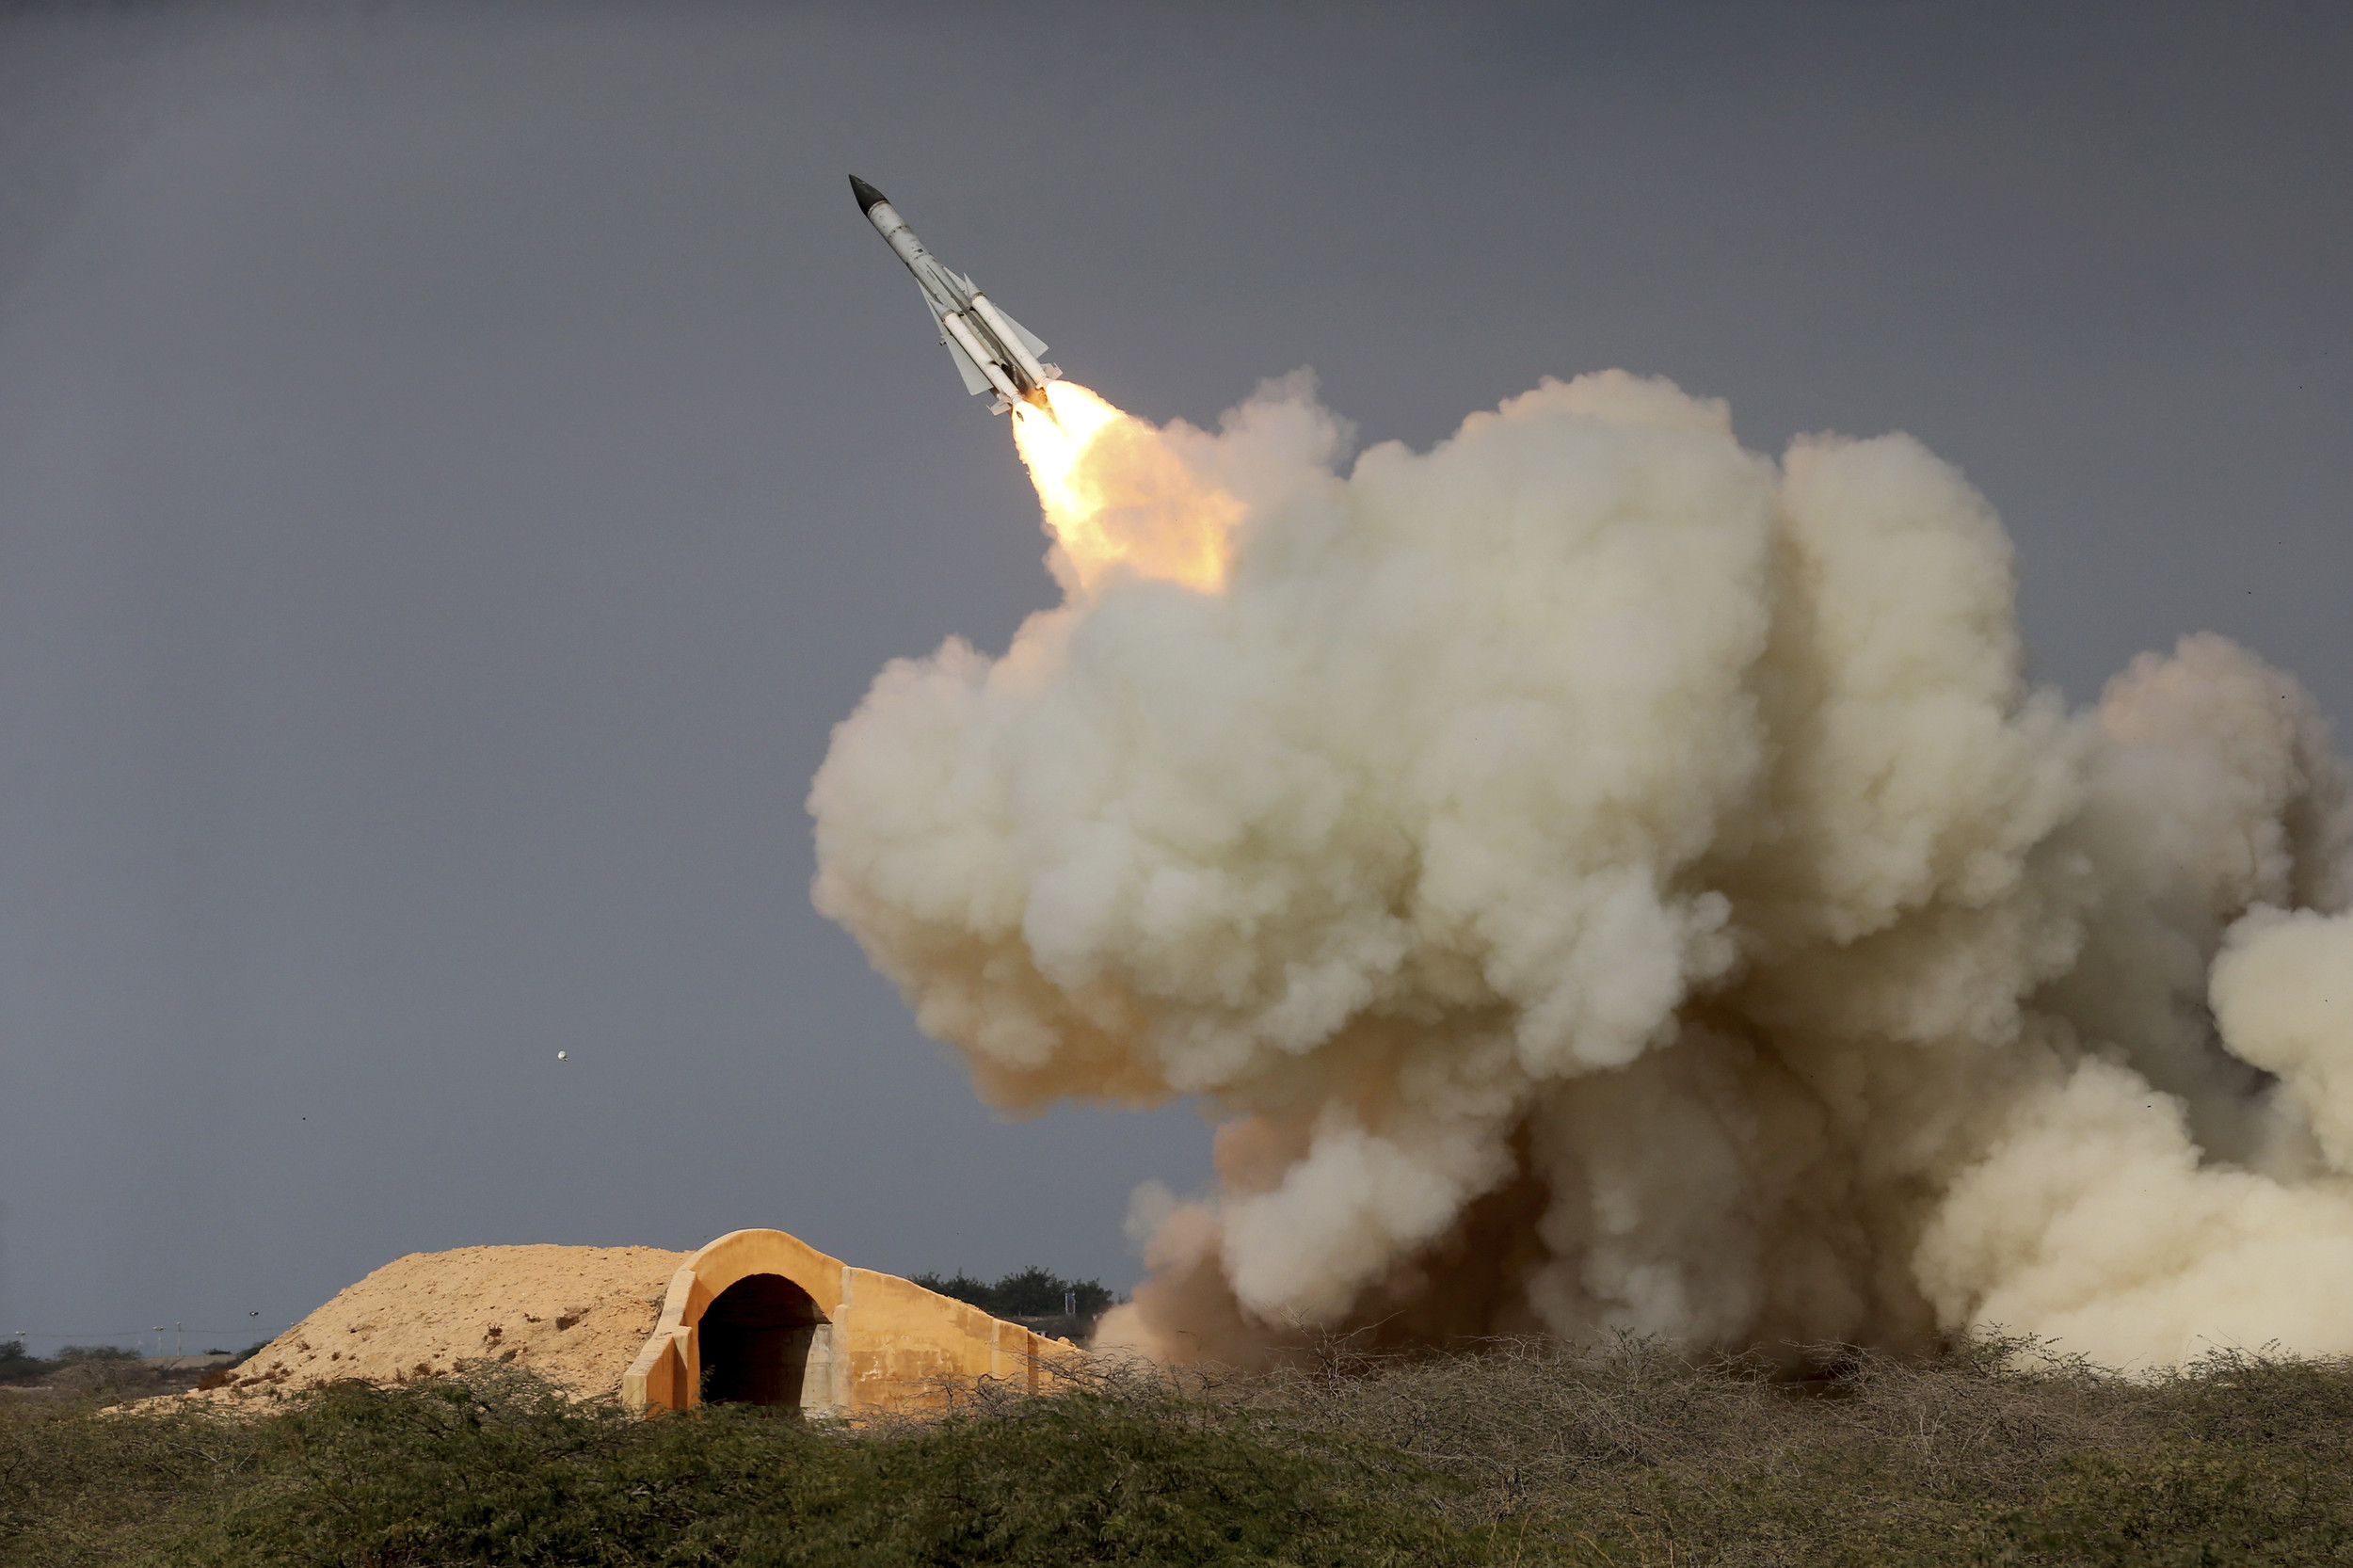 'A More Dangerous World': Iran Killing Triggers Global Alarm